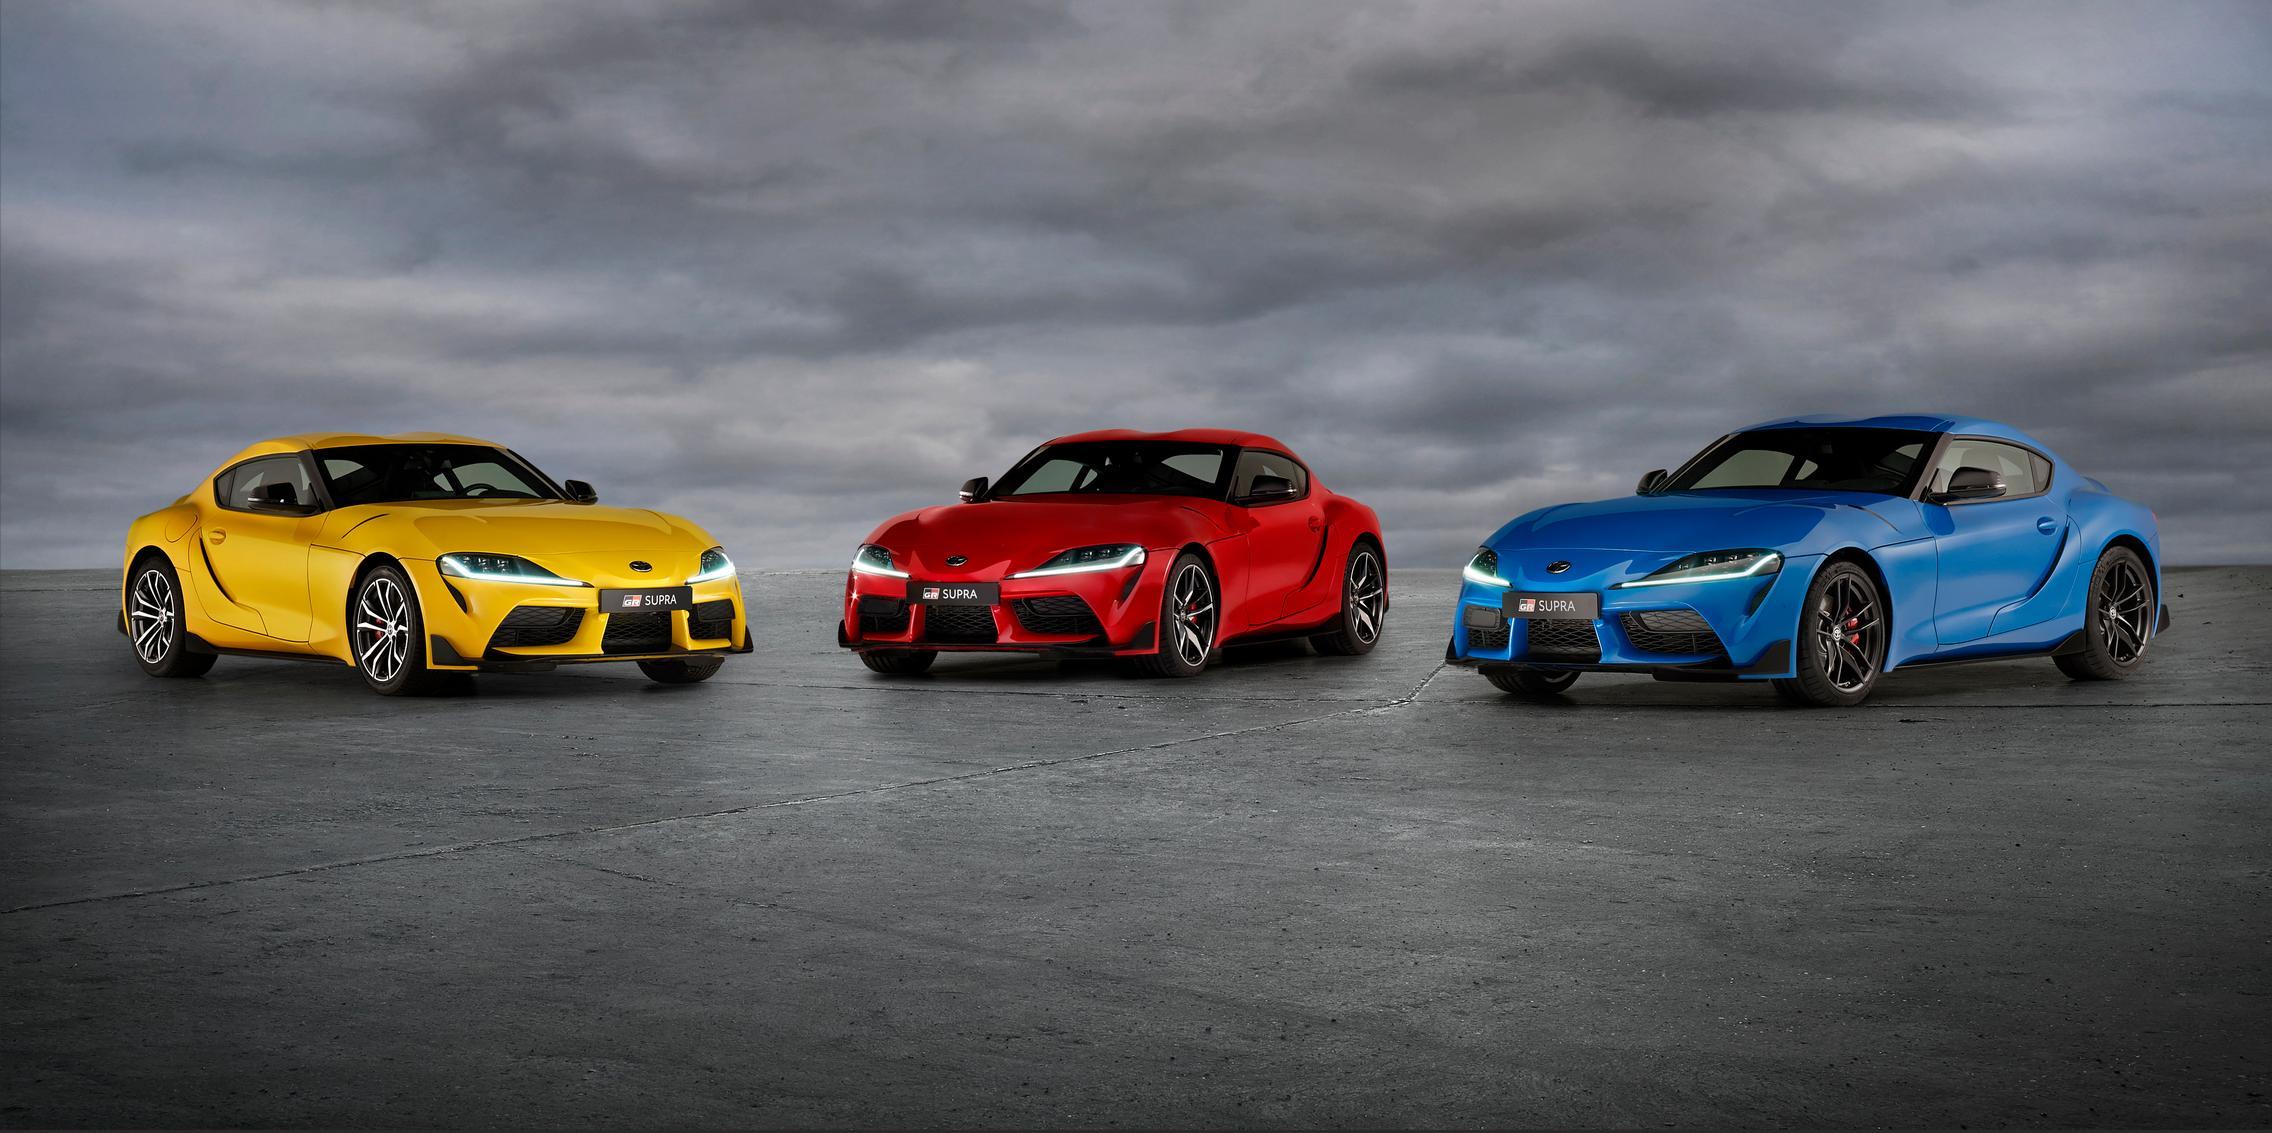 Toyota GR Supra colors